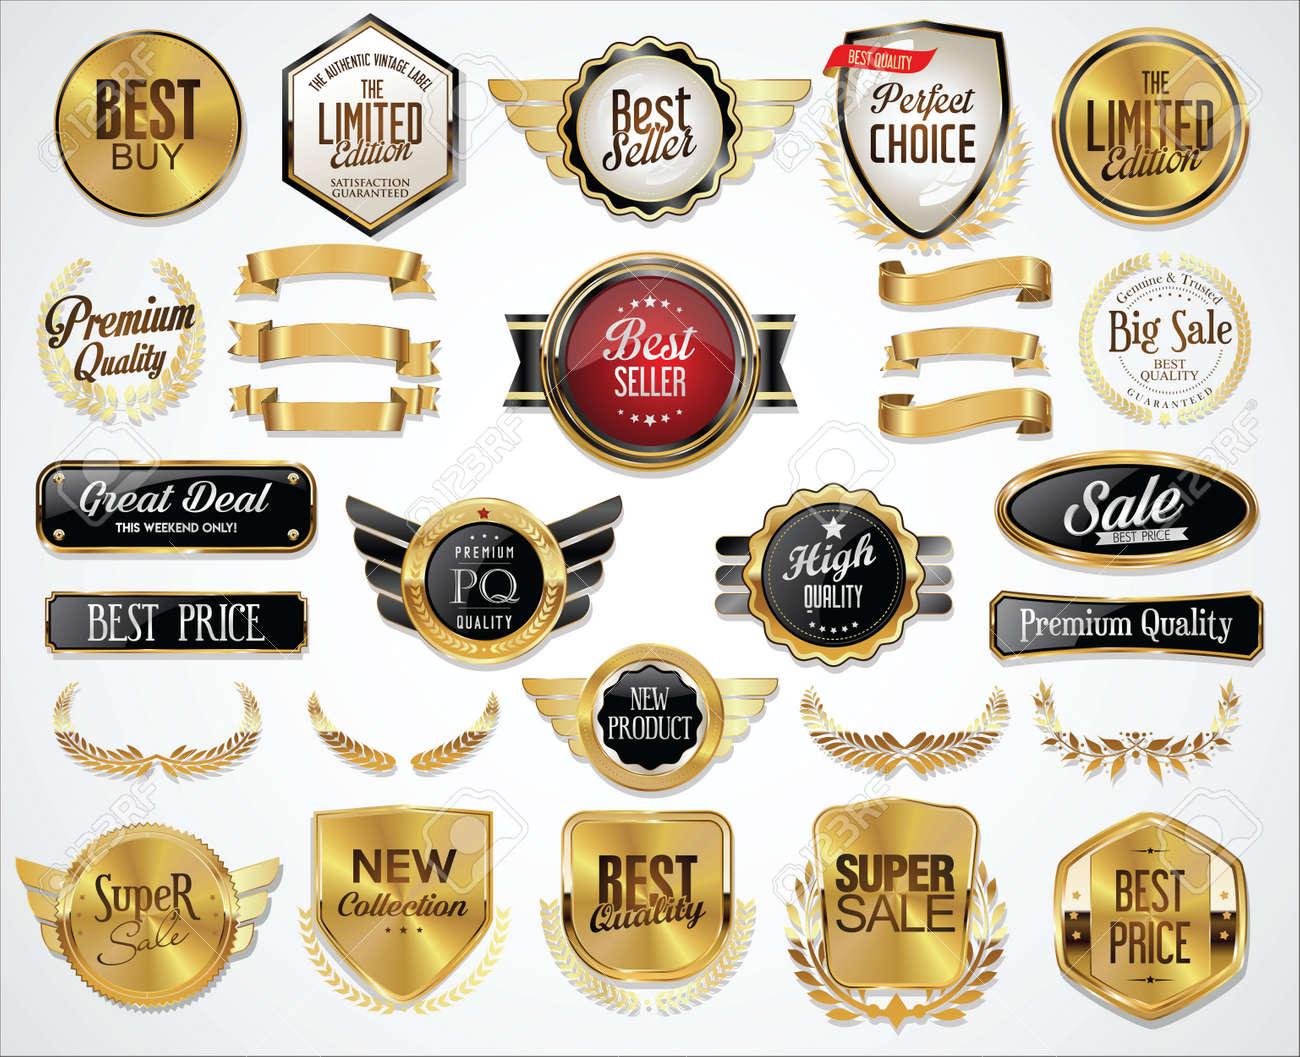 Collection of Golden badges labels laurels shield and metal plates - 155673470